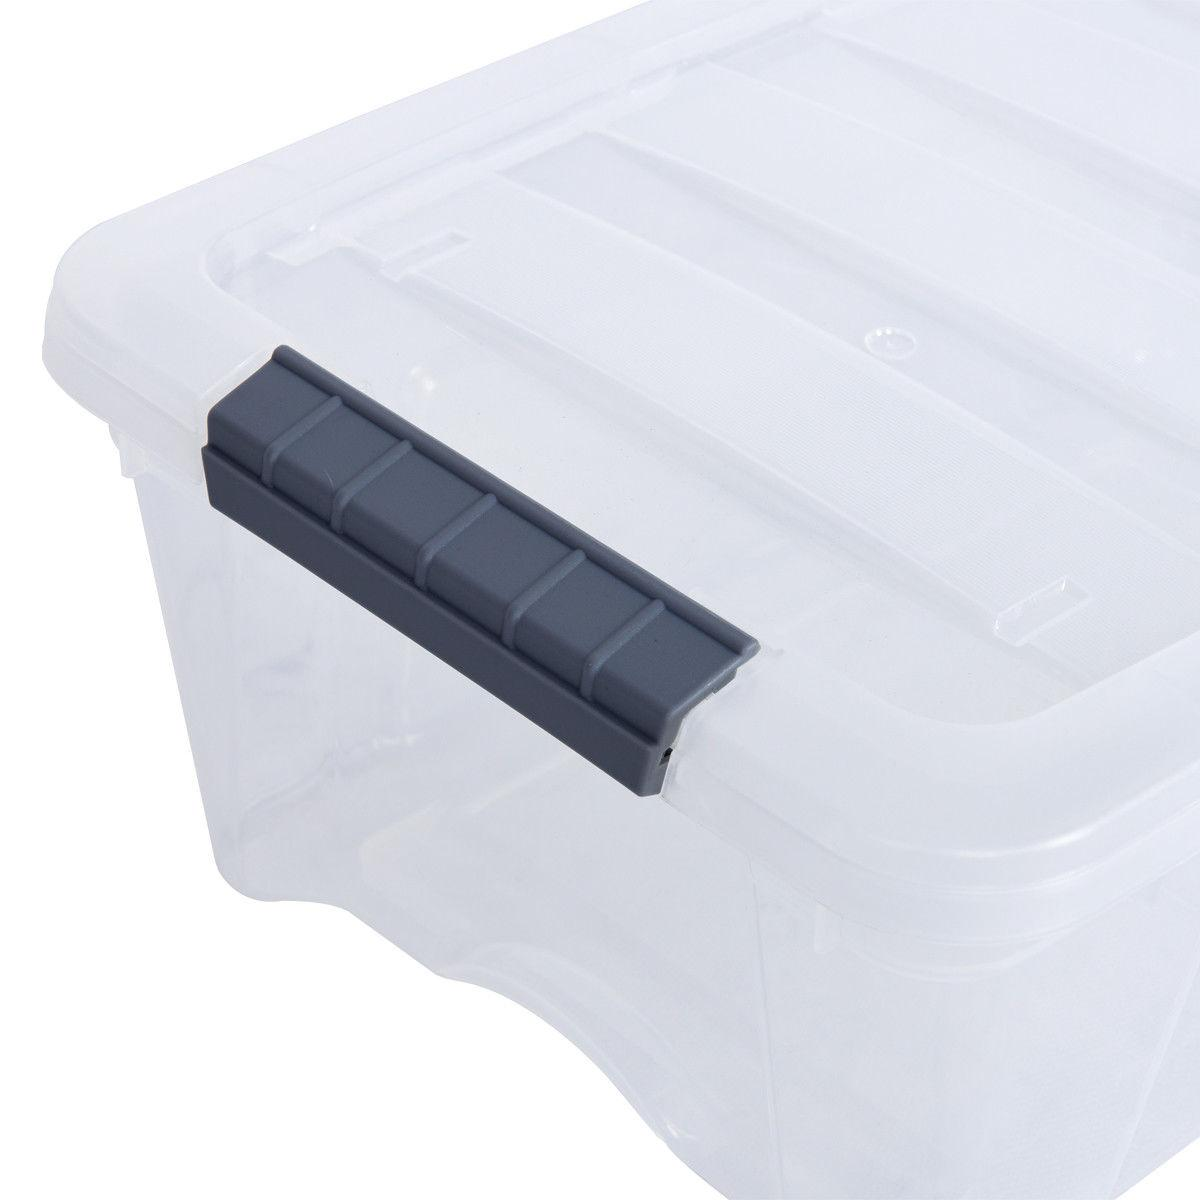 13Quart/ 12 Liter Pack Latch Box Tubs Bins Latches